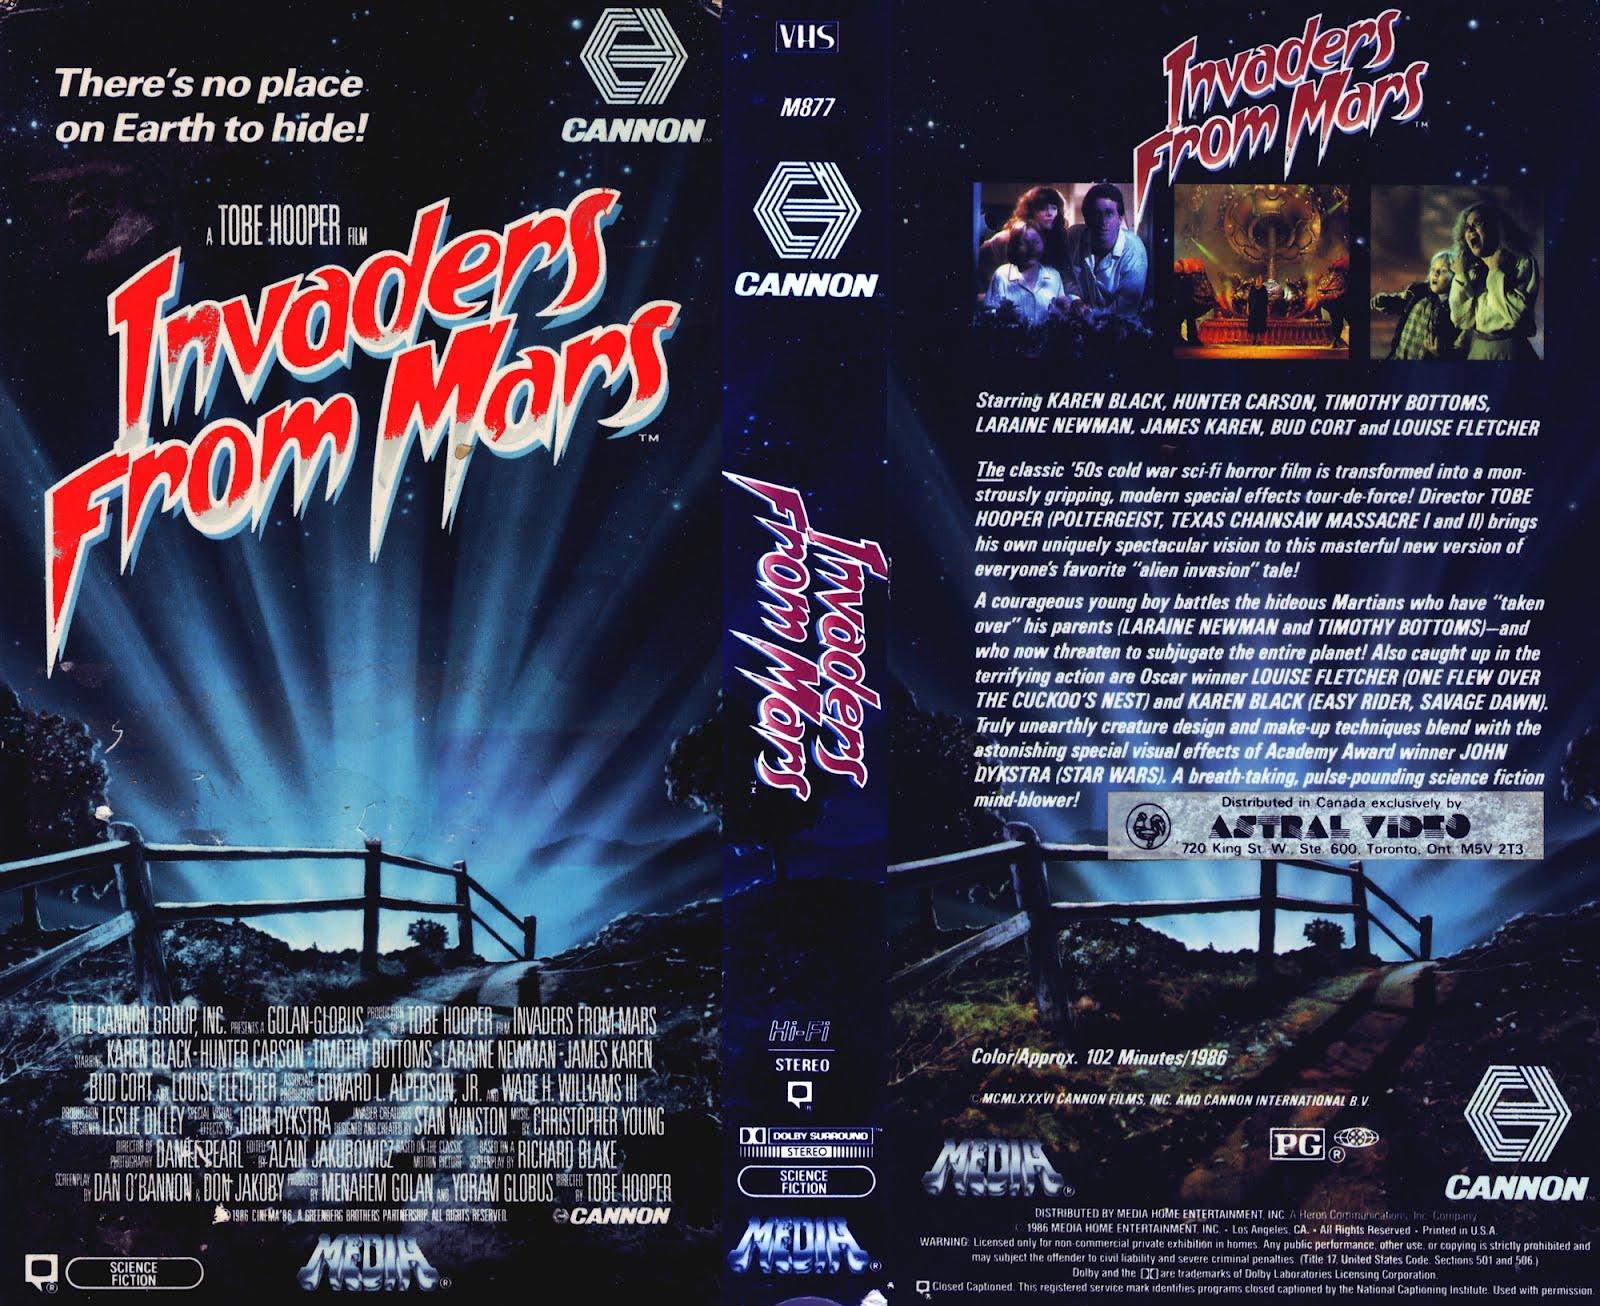 Movie cover pics